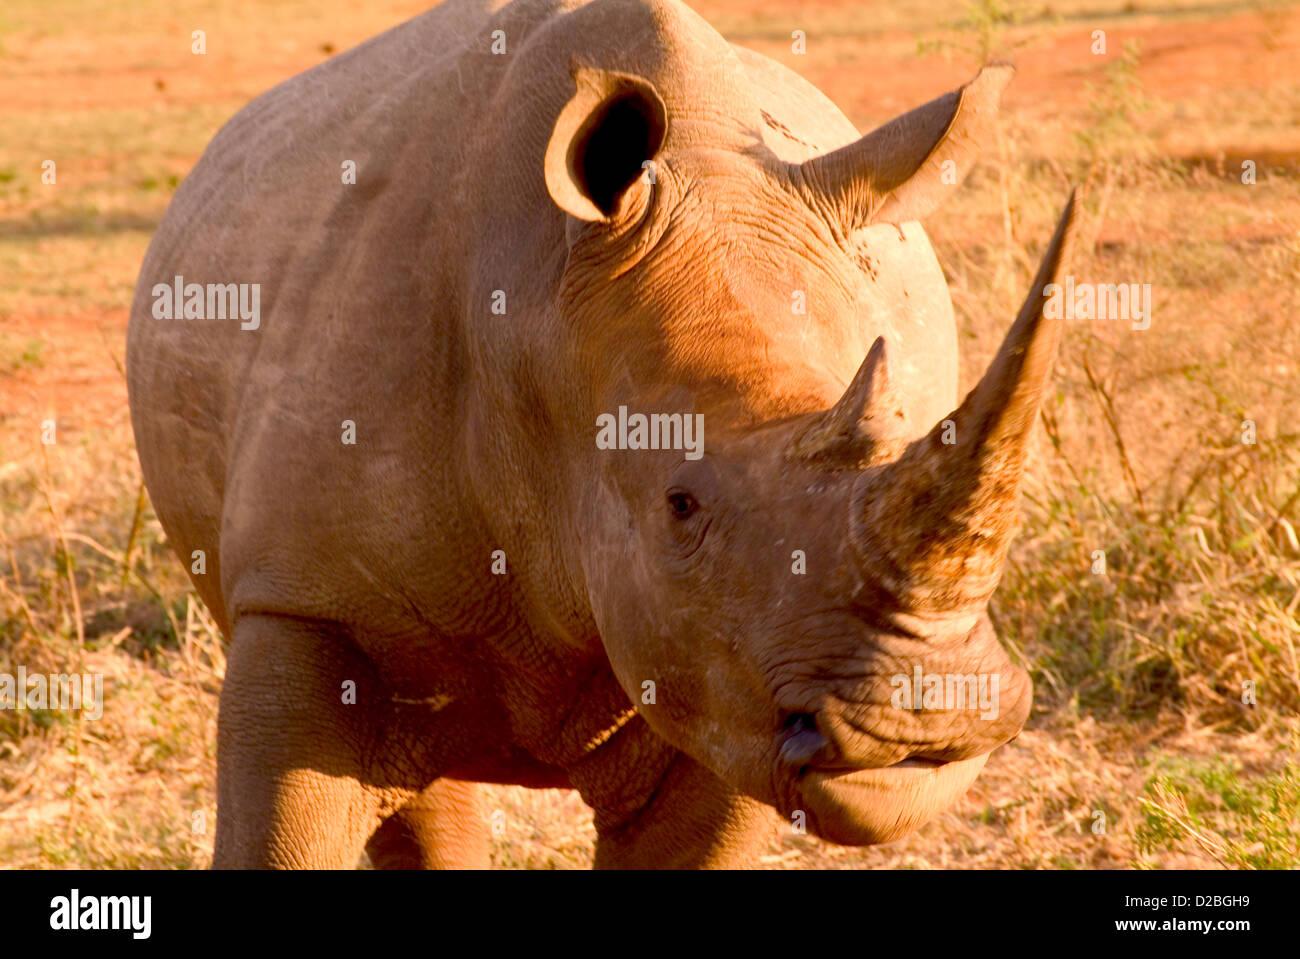 Sud Africa, Parco Nazionale Kruger. Raro rinoceronte bianco Immagini Stock